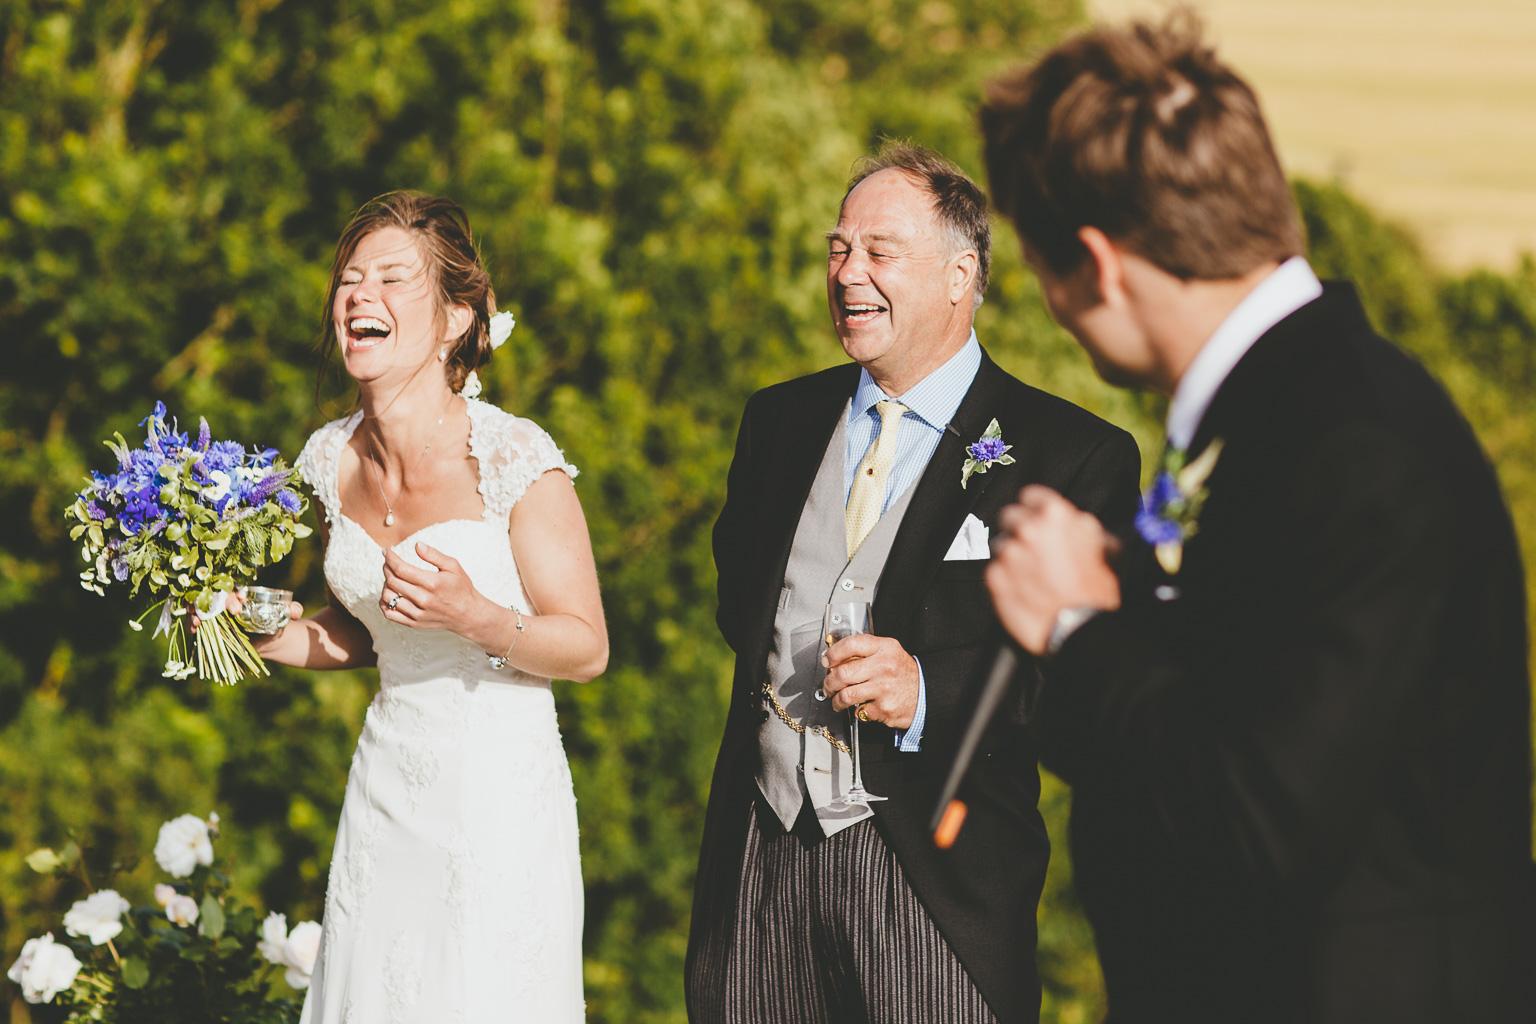 Best-wedding-photographers-Dorset-00008